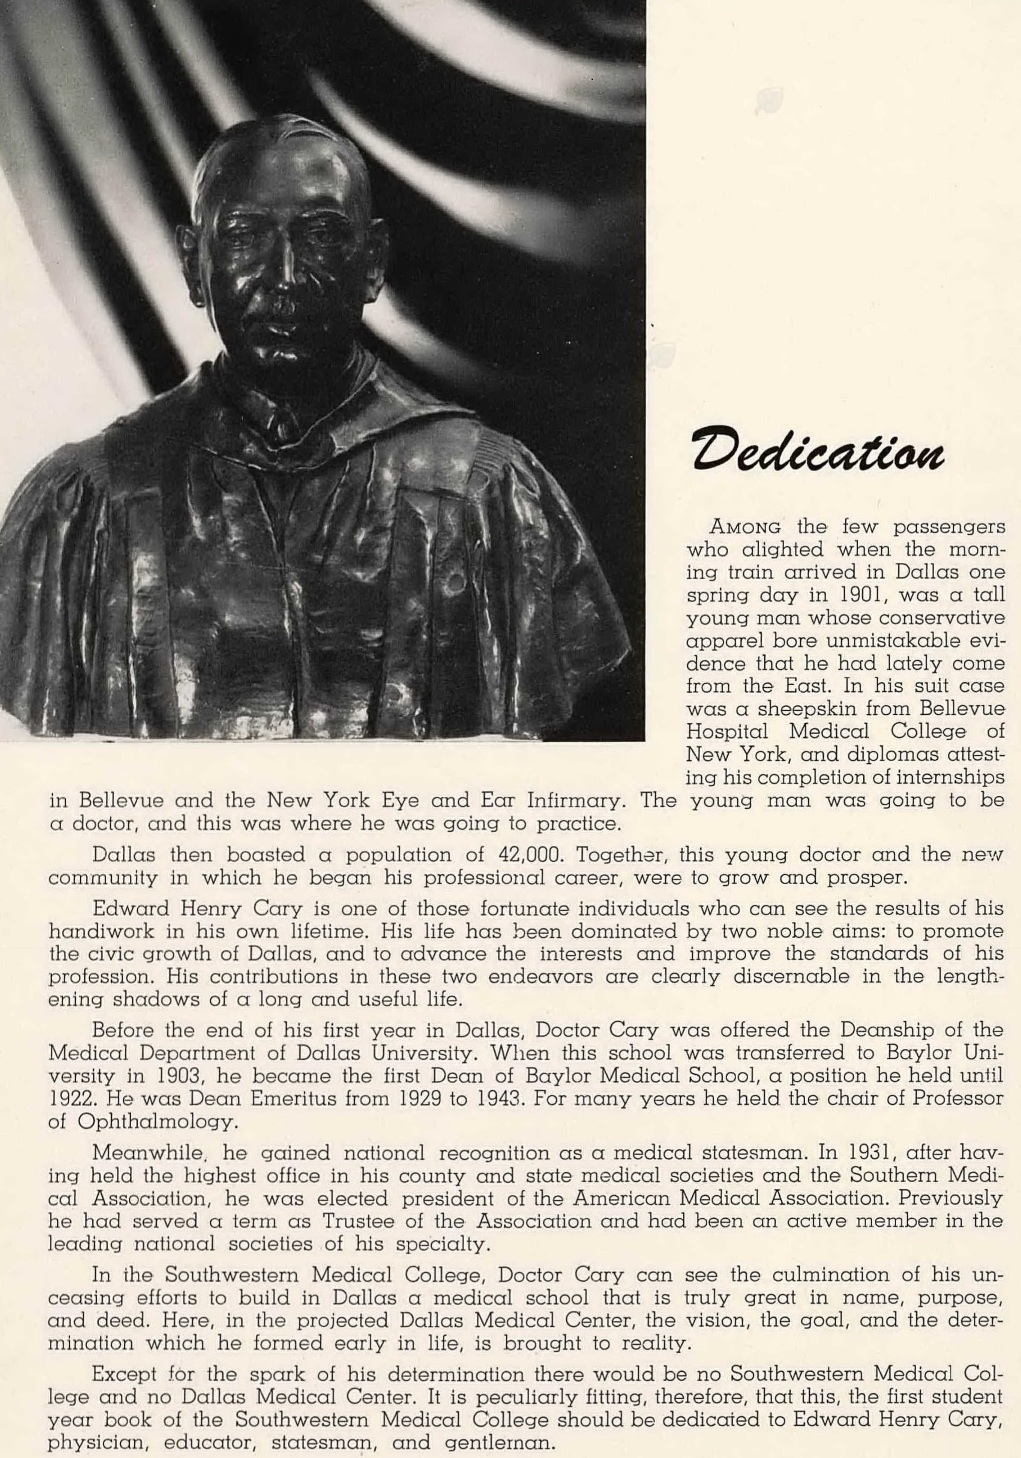 southwestern-medical-college_1944 yrbk_caduceus_dedication_dr-e-h-cary